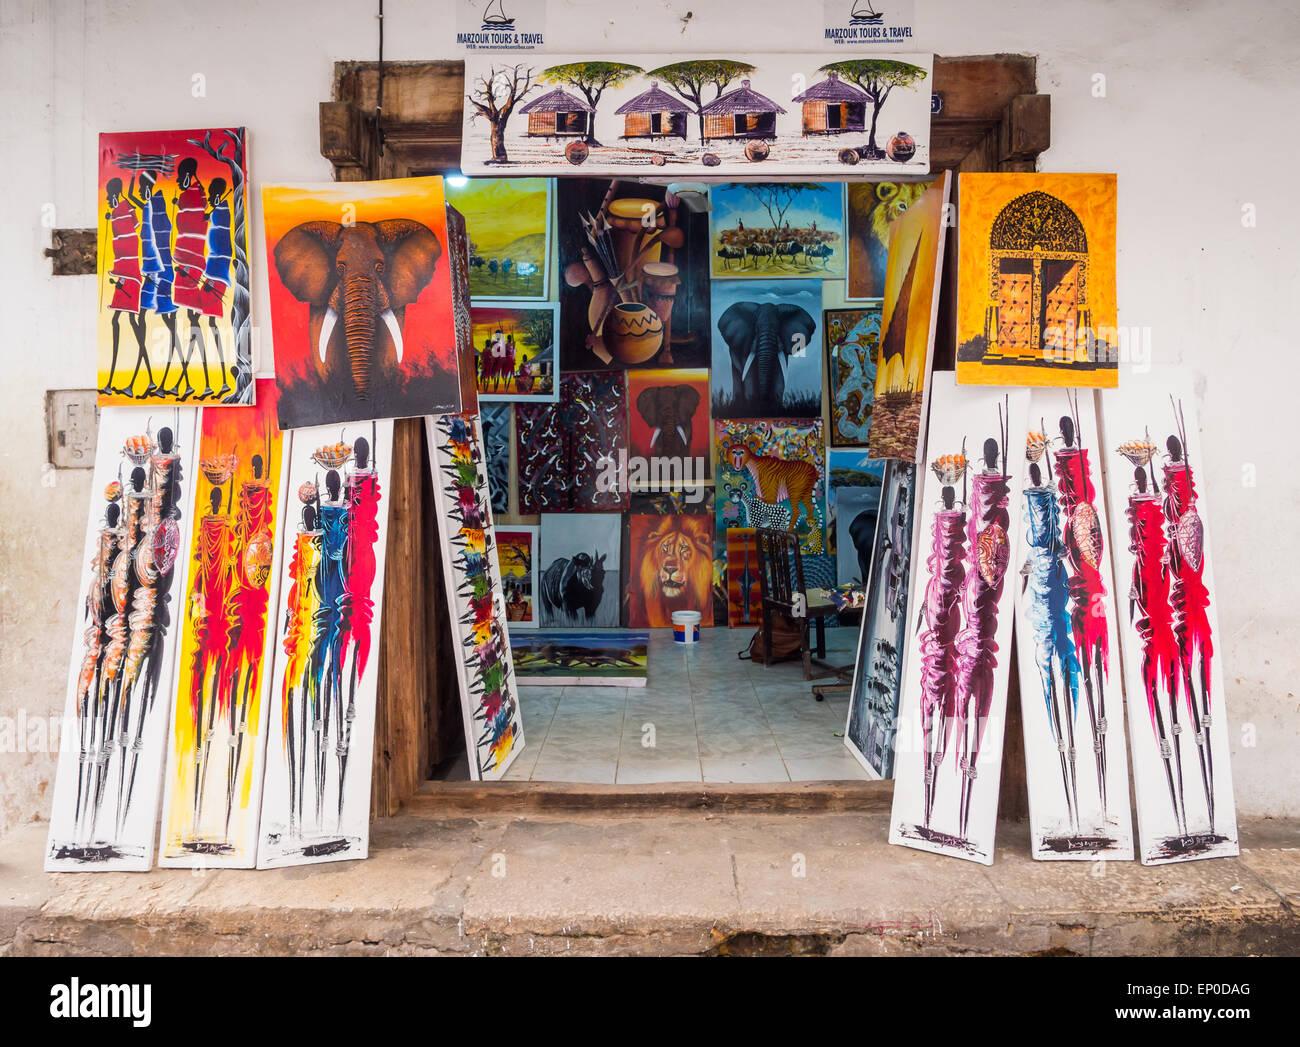 Store selling colorful tingatinga (tinga tinga) paintings as souvenirs for tourists in Stone Town, Zanzibar, Tanzania, - Stock Image